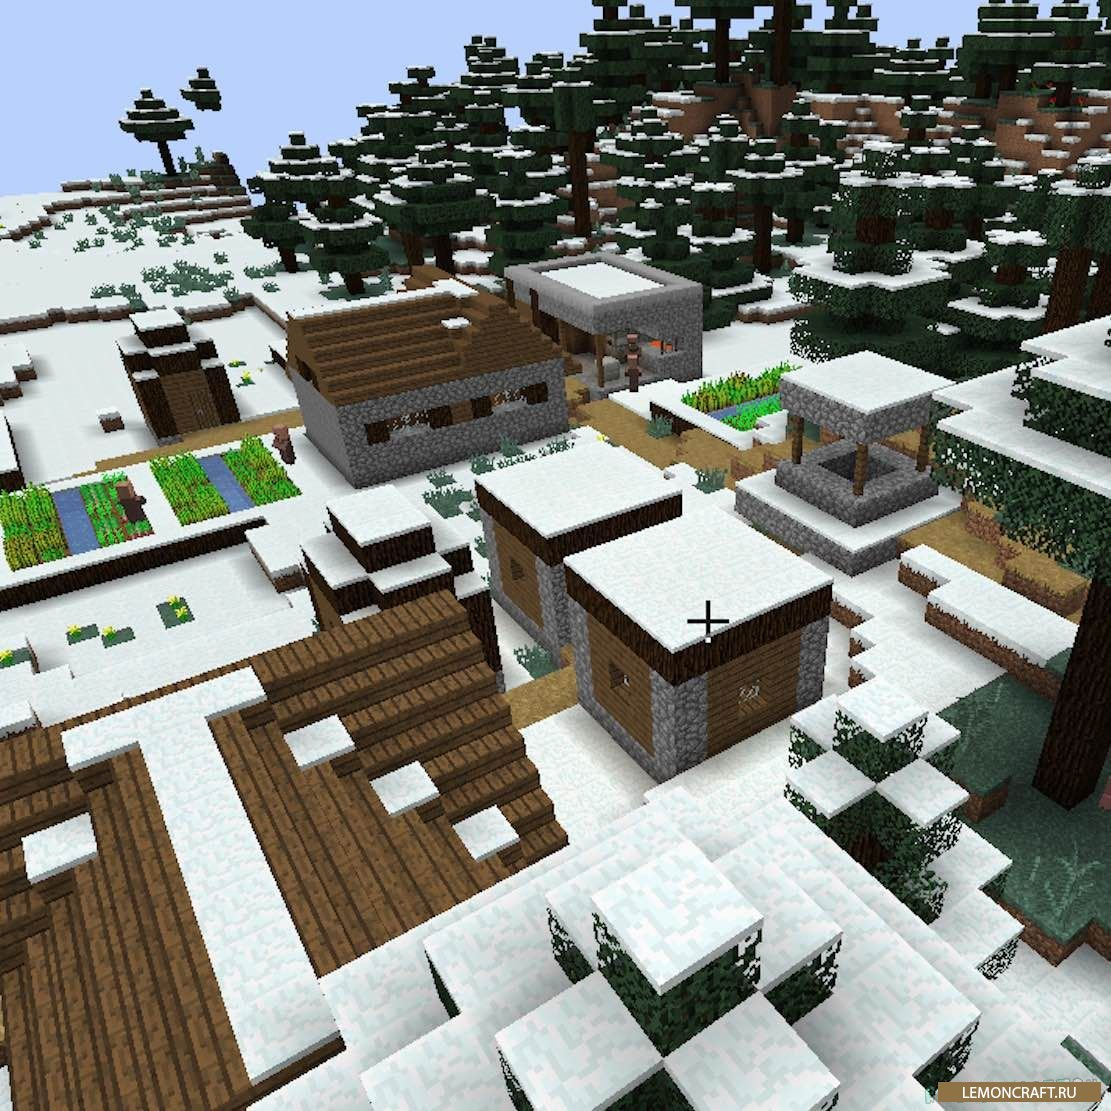 Мод на таежный постройки SnowVillage [1.12.2] [1.11.2]